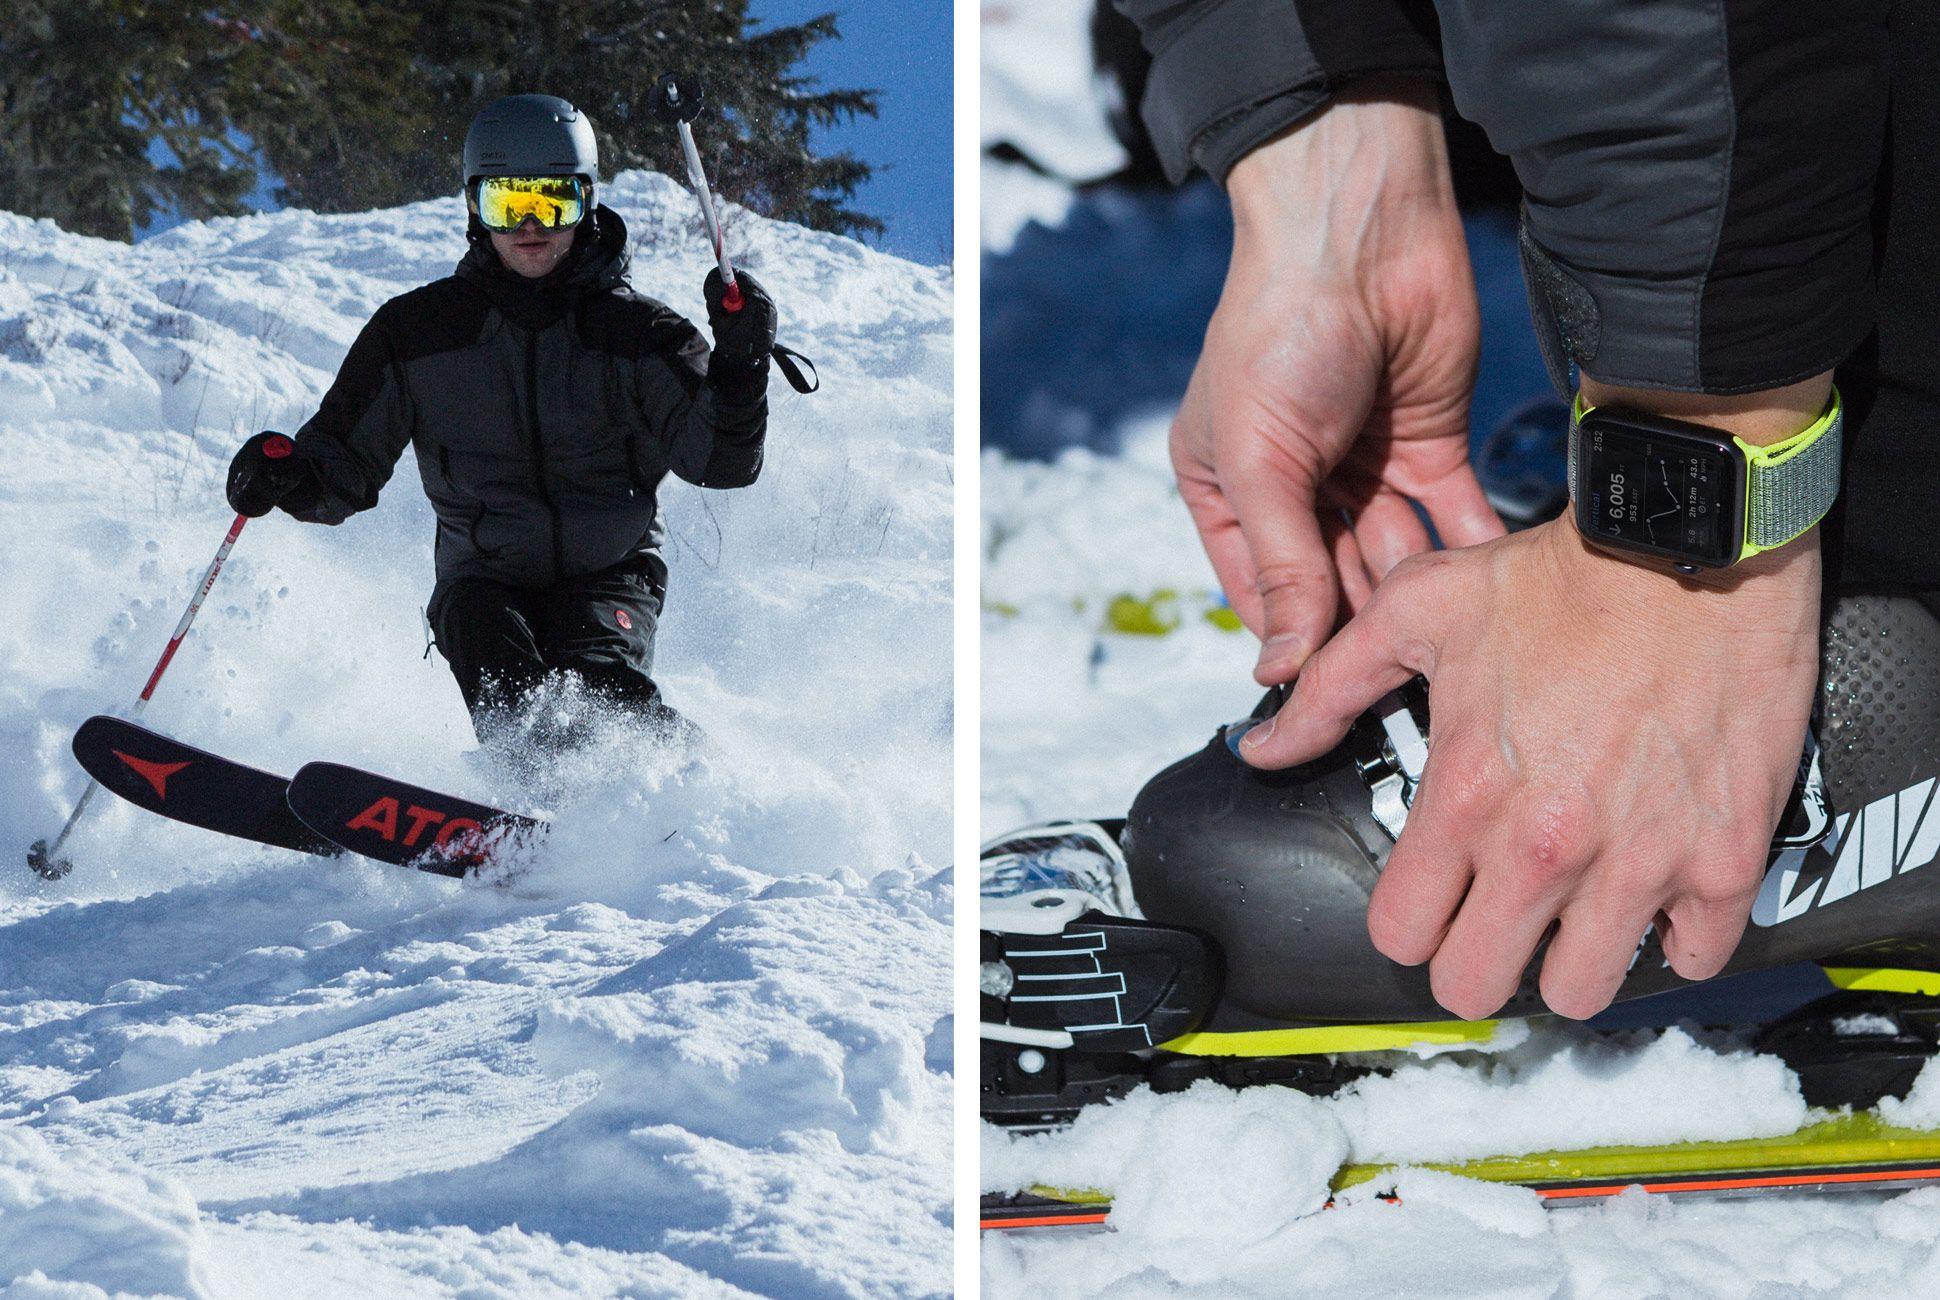 apple-watch-ski-track-gear-patrol-slide-1